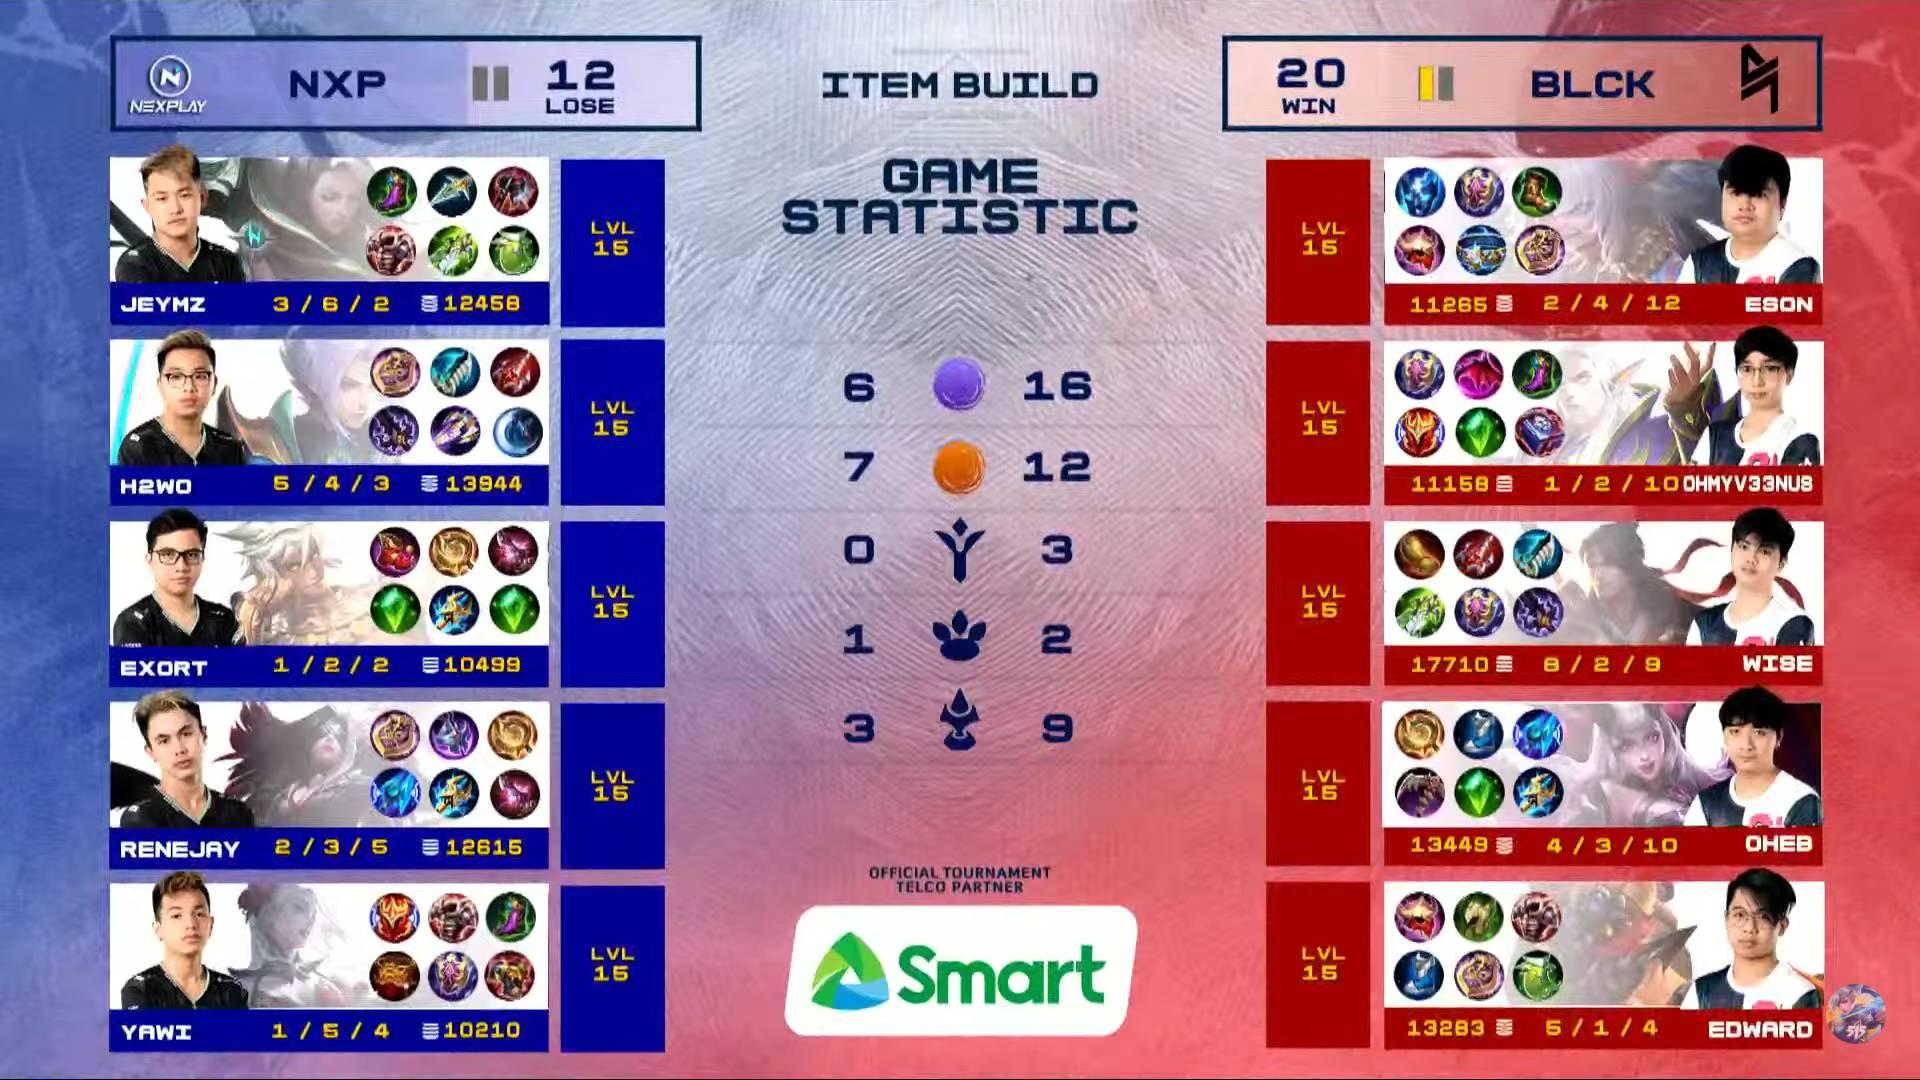 MPL-PH-Season-7-Blacklist-def-Nexplay-Game-One Blacklist survives Renejay-H2wo hijack, ends MPL PH elims at top spot ESports Mobile Legends MPL-PH News  - philippine sports news